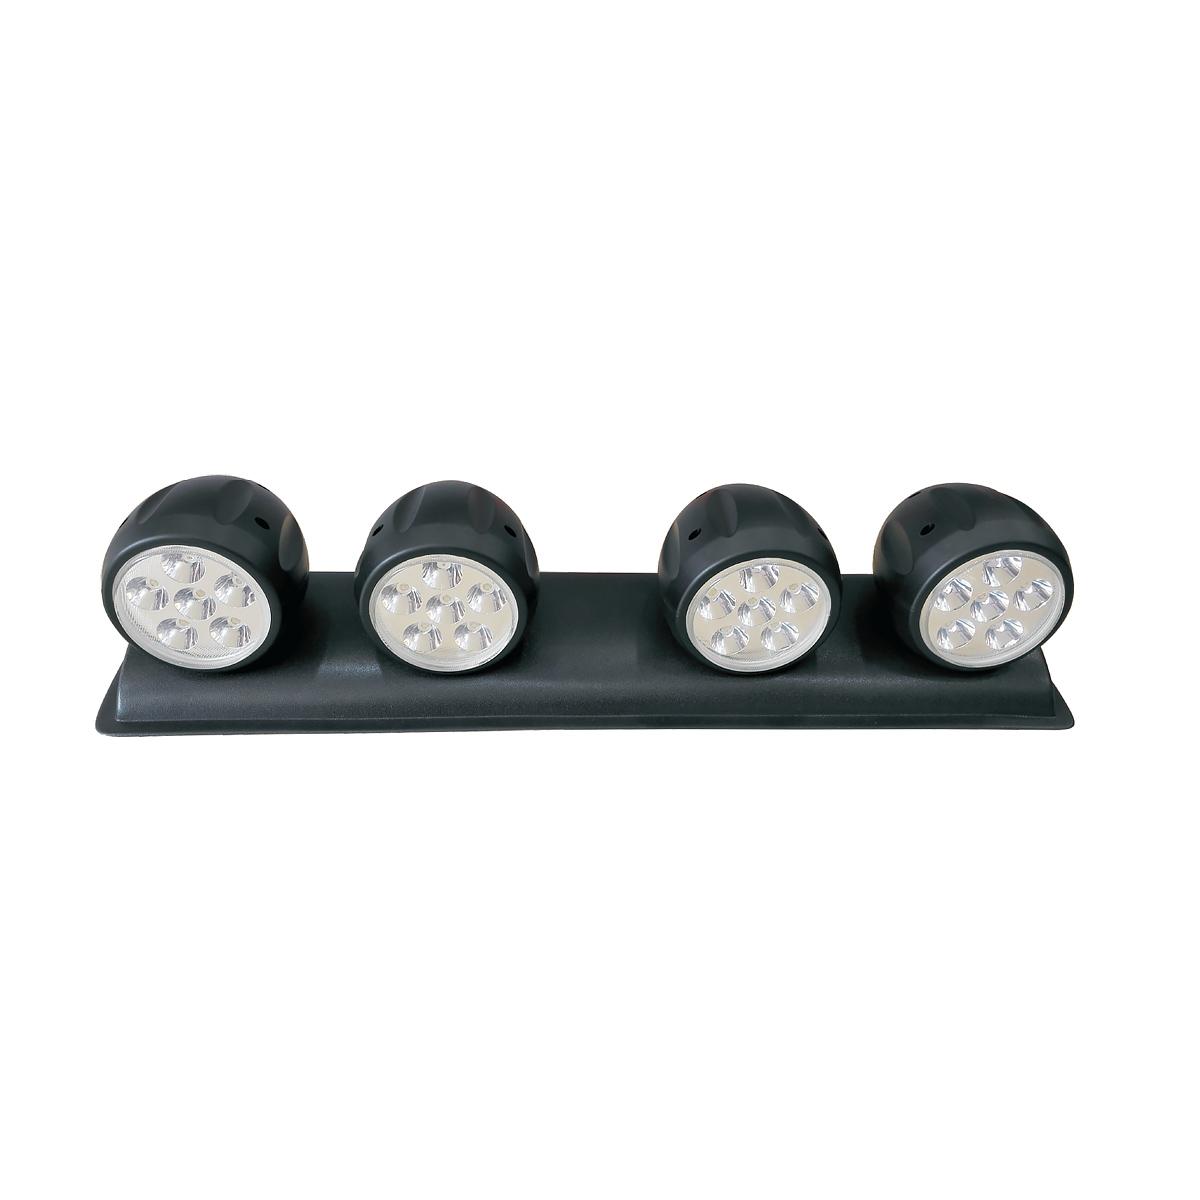 LED Roof Work Light 4 X Round 72 WATT  Spot Beam